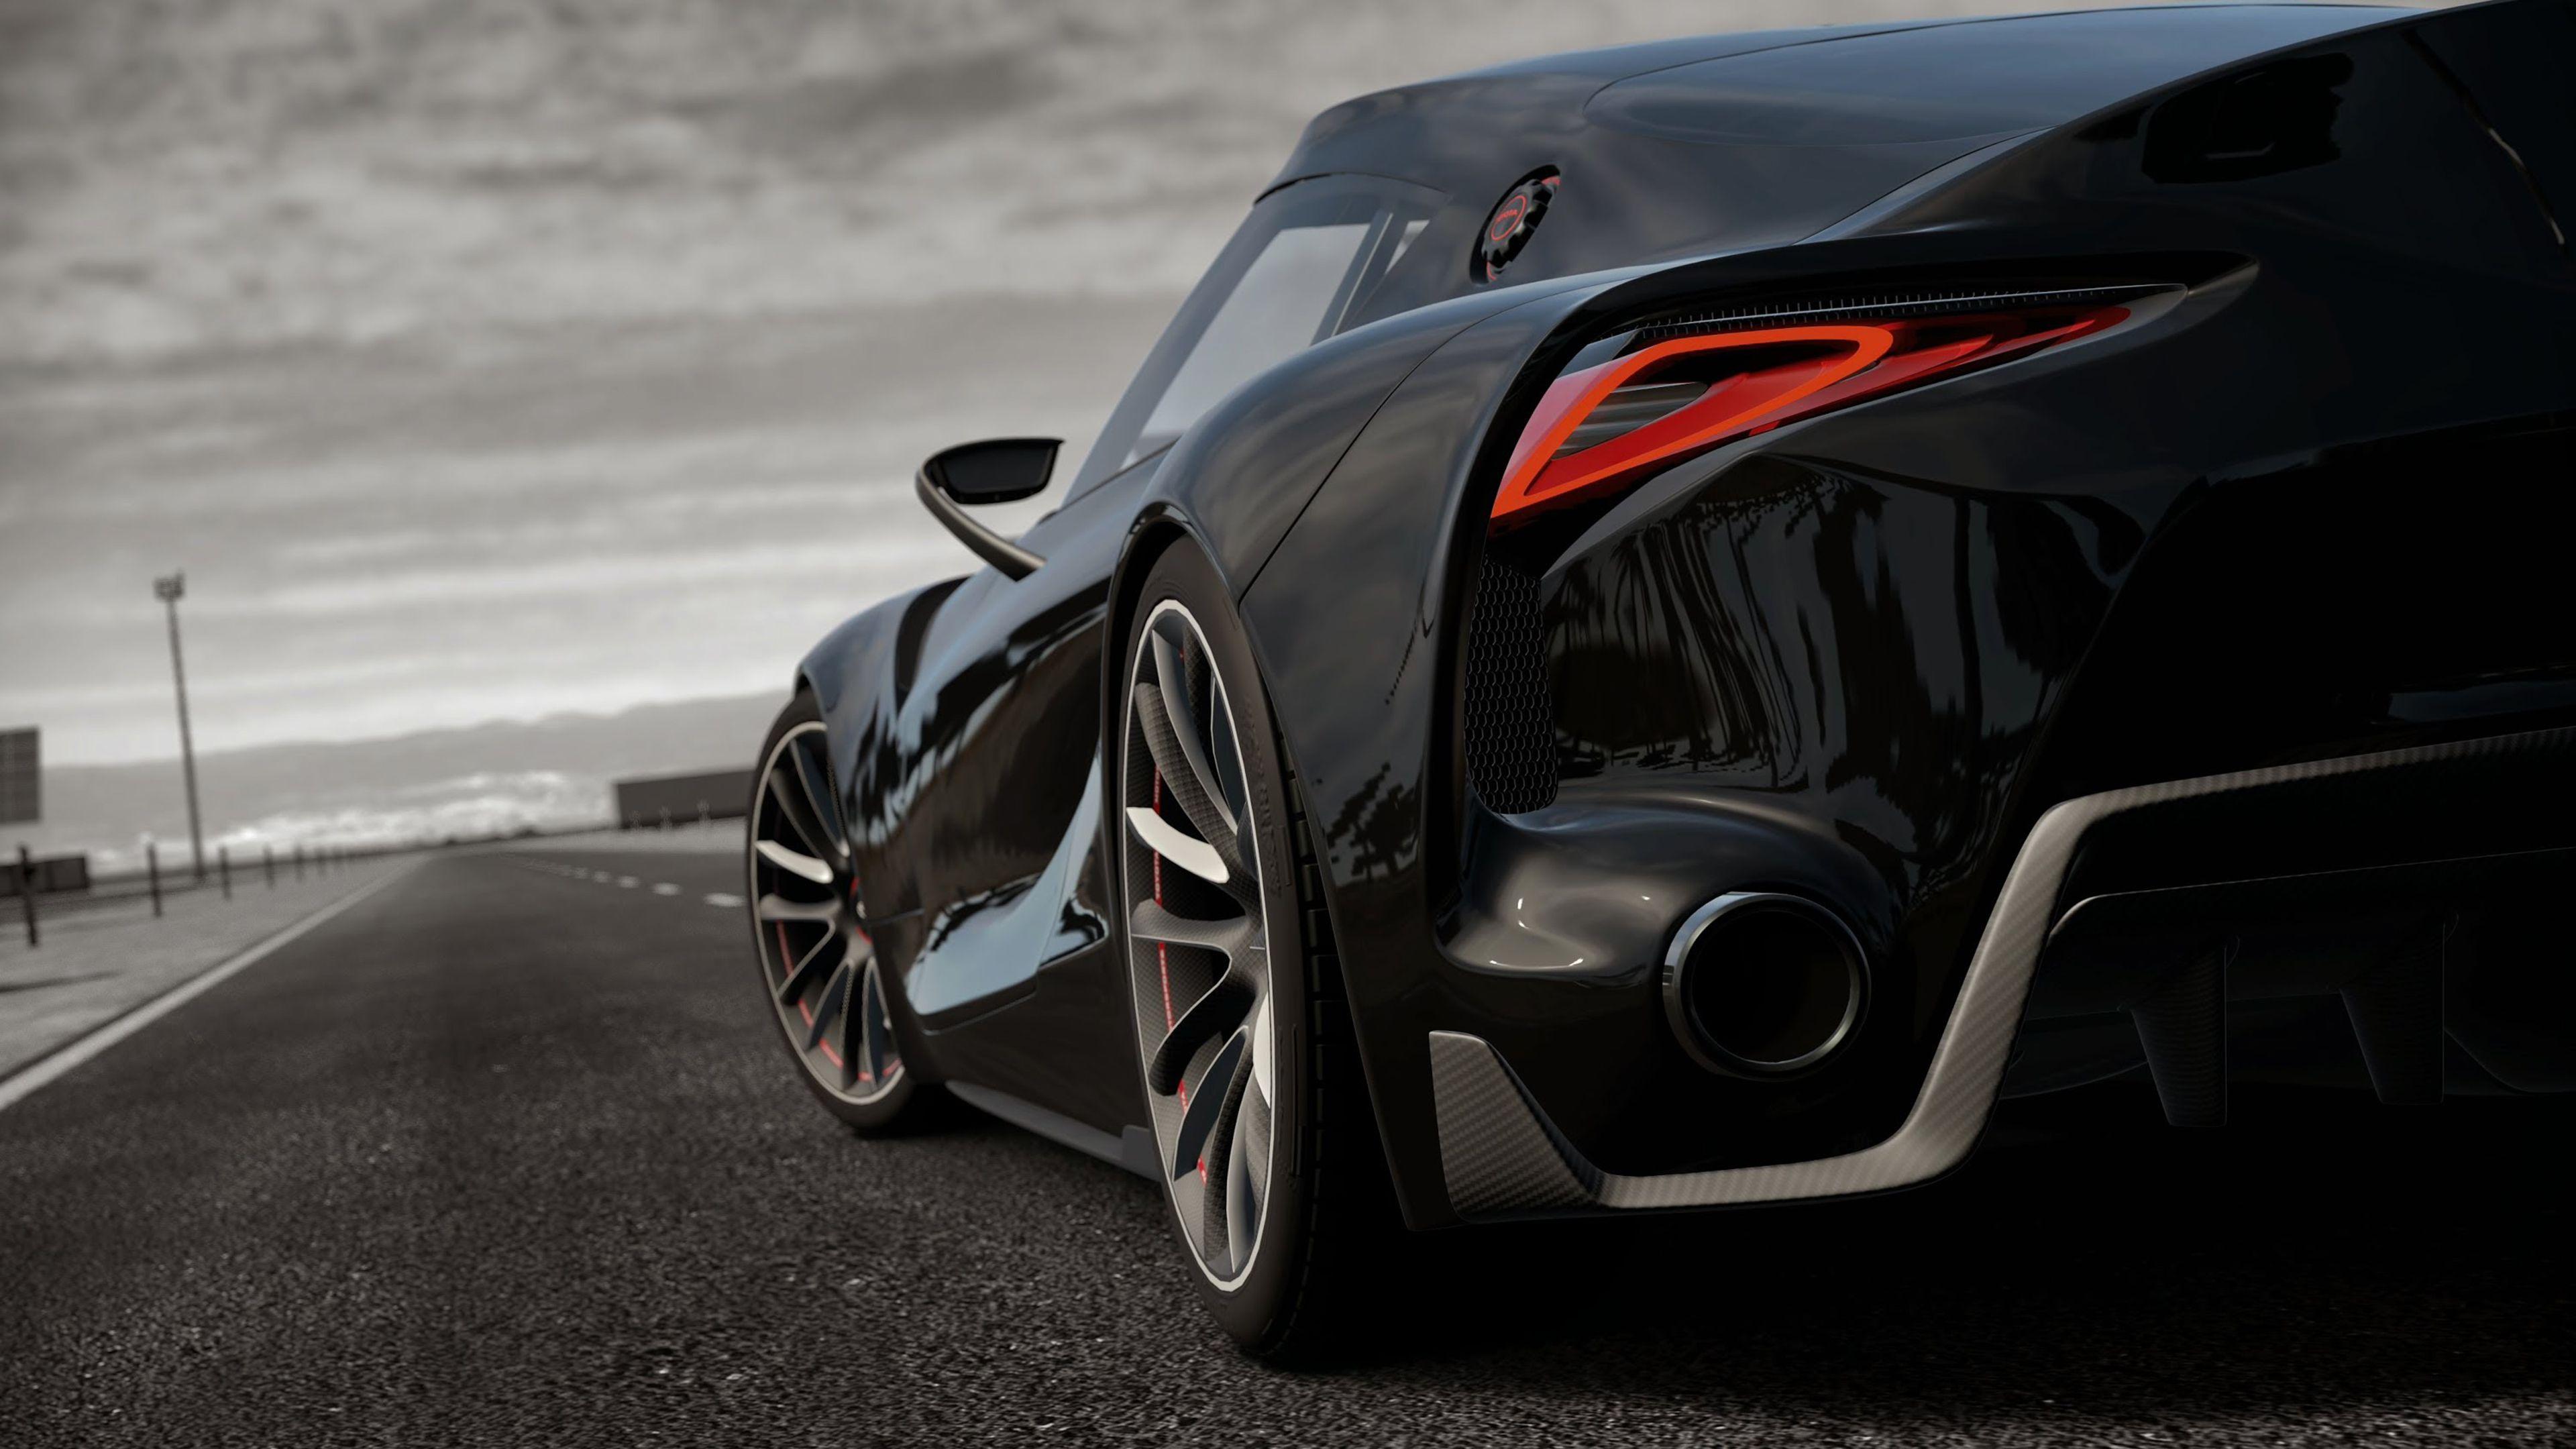 F1 fia 2021 concept car. Ultra Hd 4k Best Car Wallpaper 4k